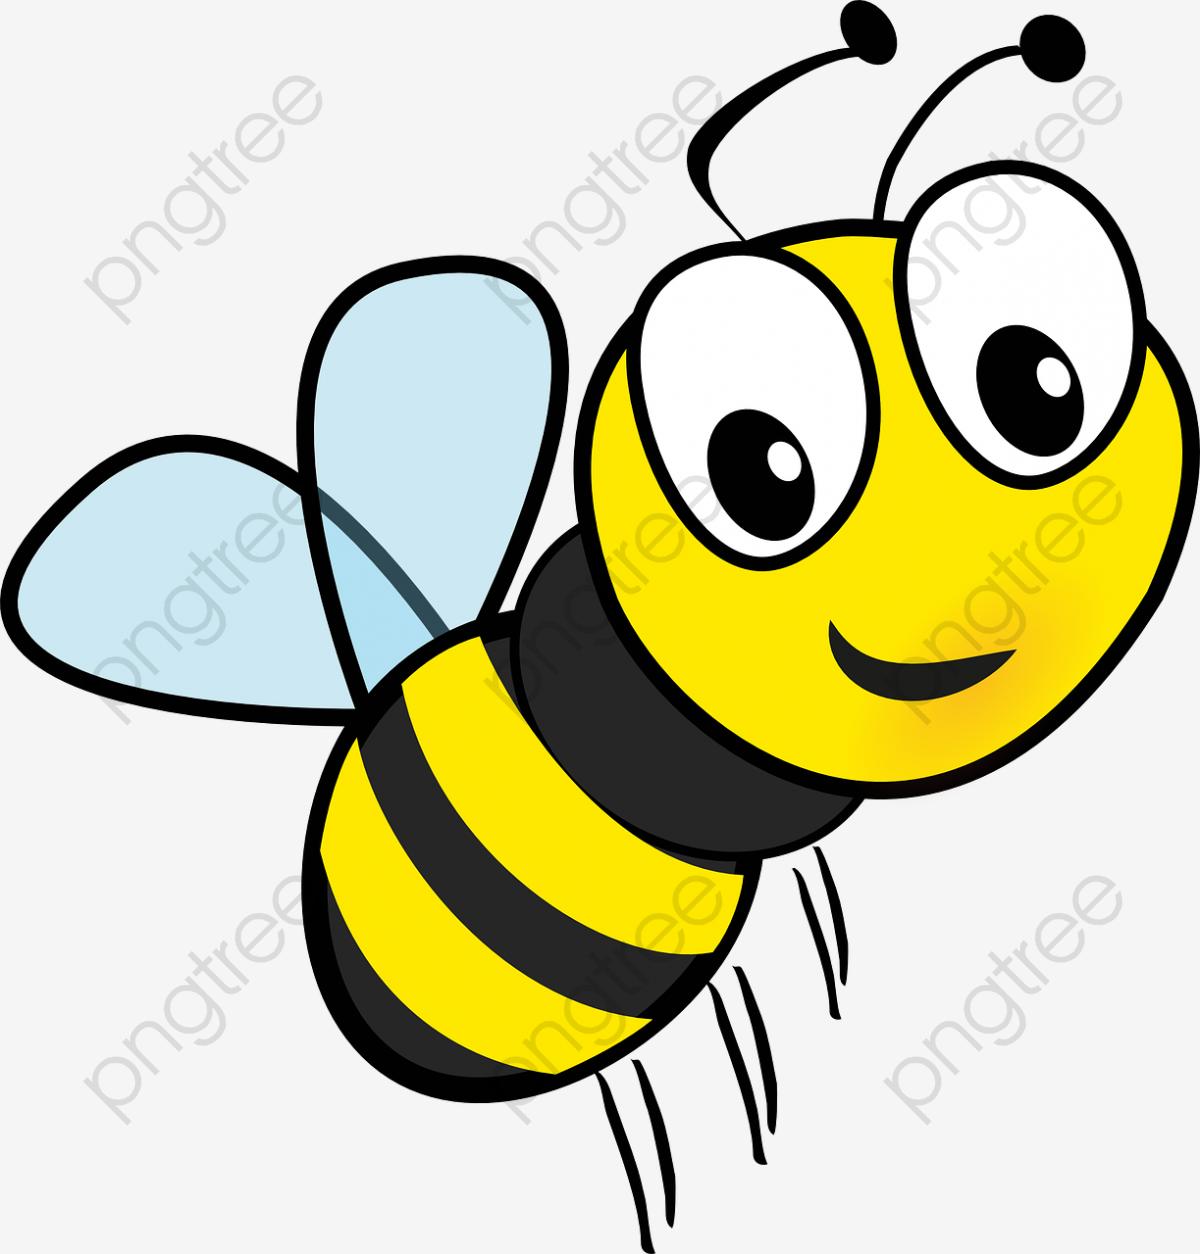 Clipart bee cartoon. Flying flight png